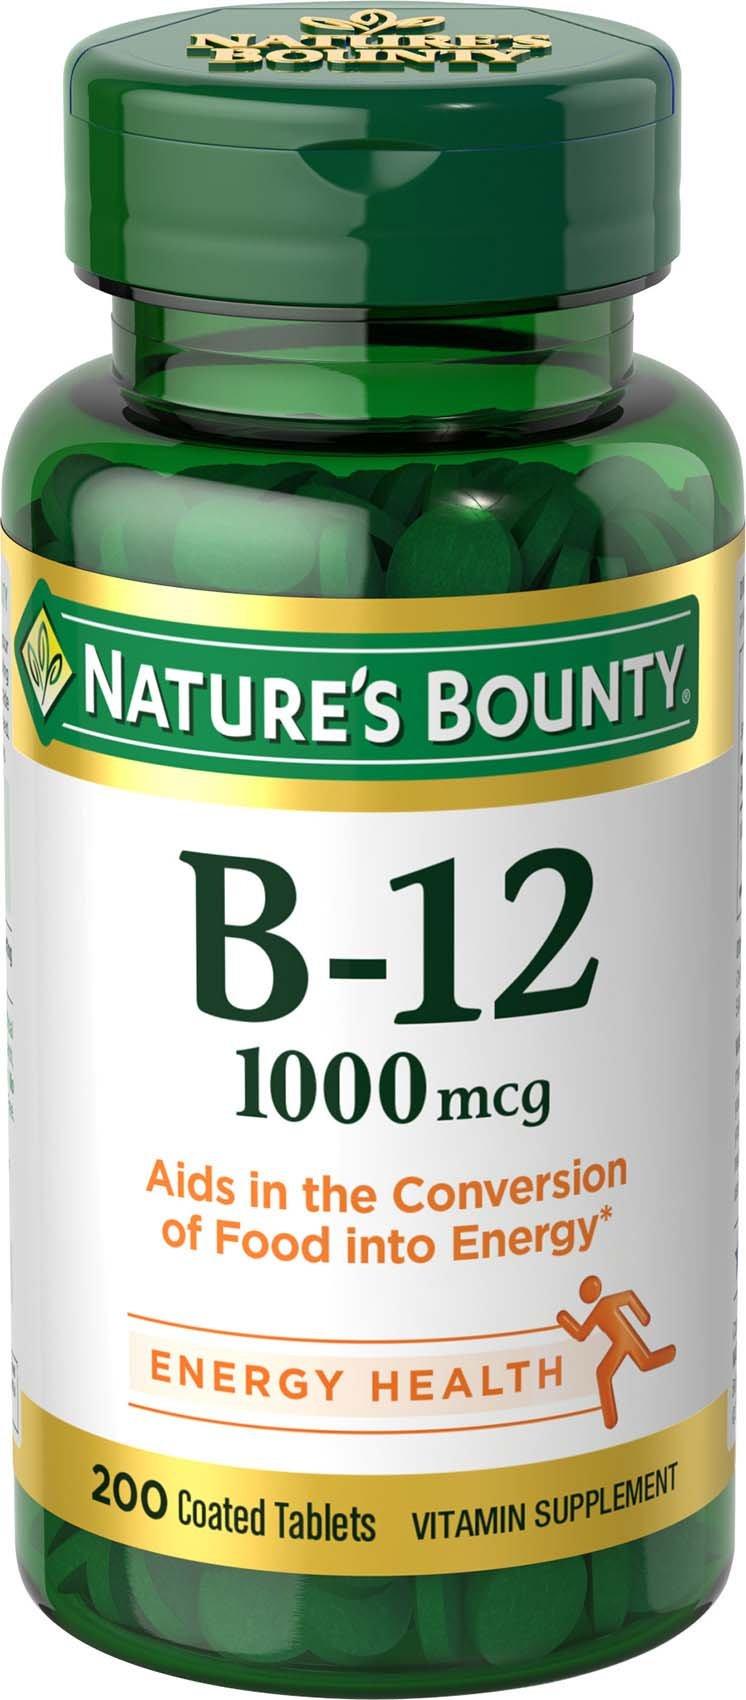 Natures Bounty Vitamin B-12 1000 Mcg Tablets, Value Size - 200 Ea